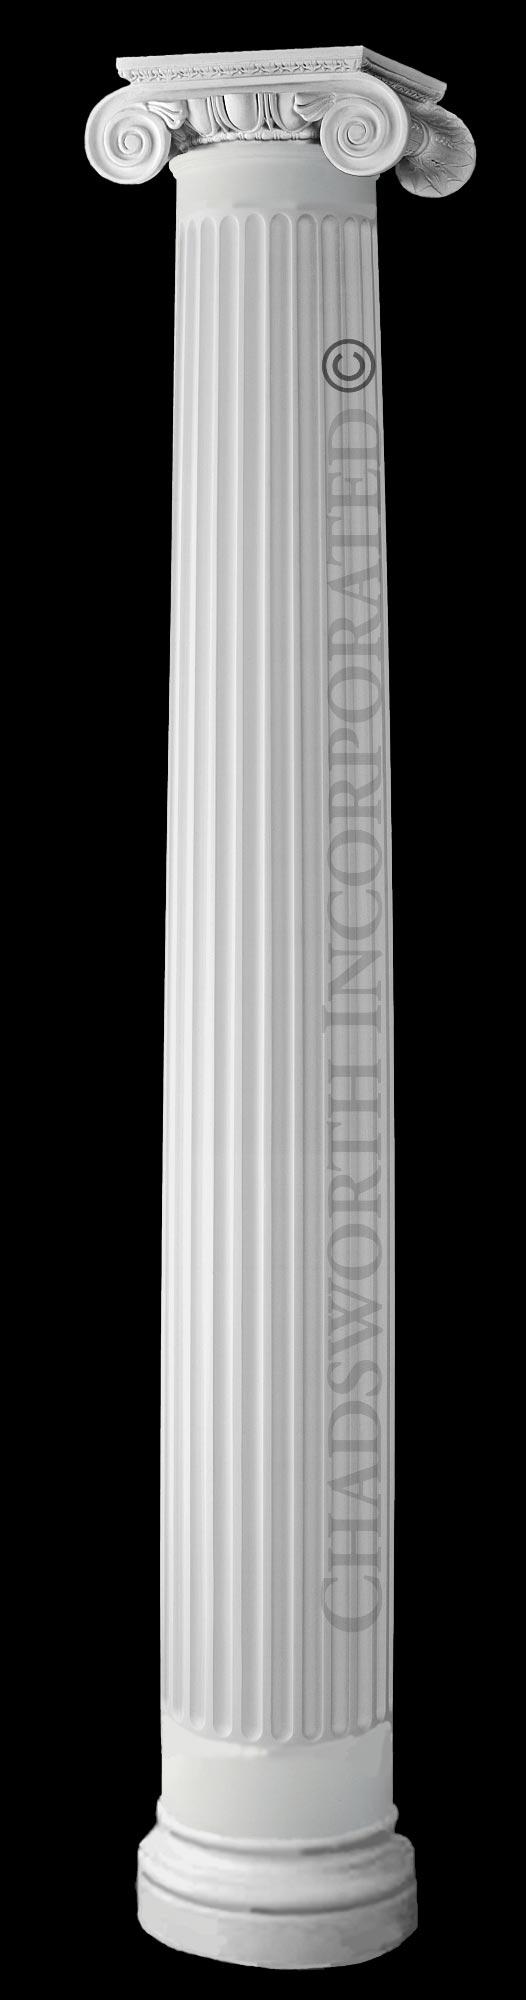 Design 645 Rb Ionic Order Roman Frp Composite